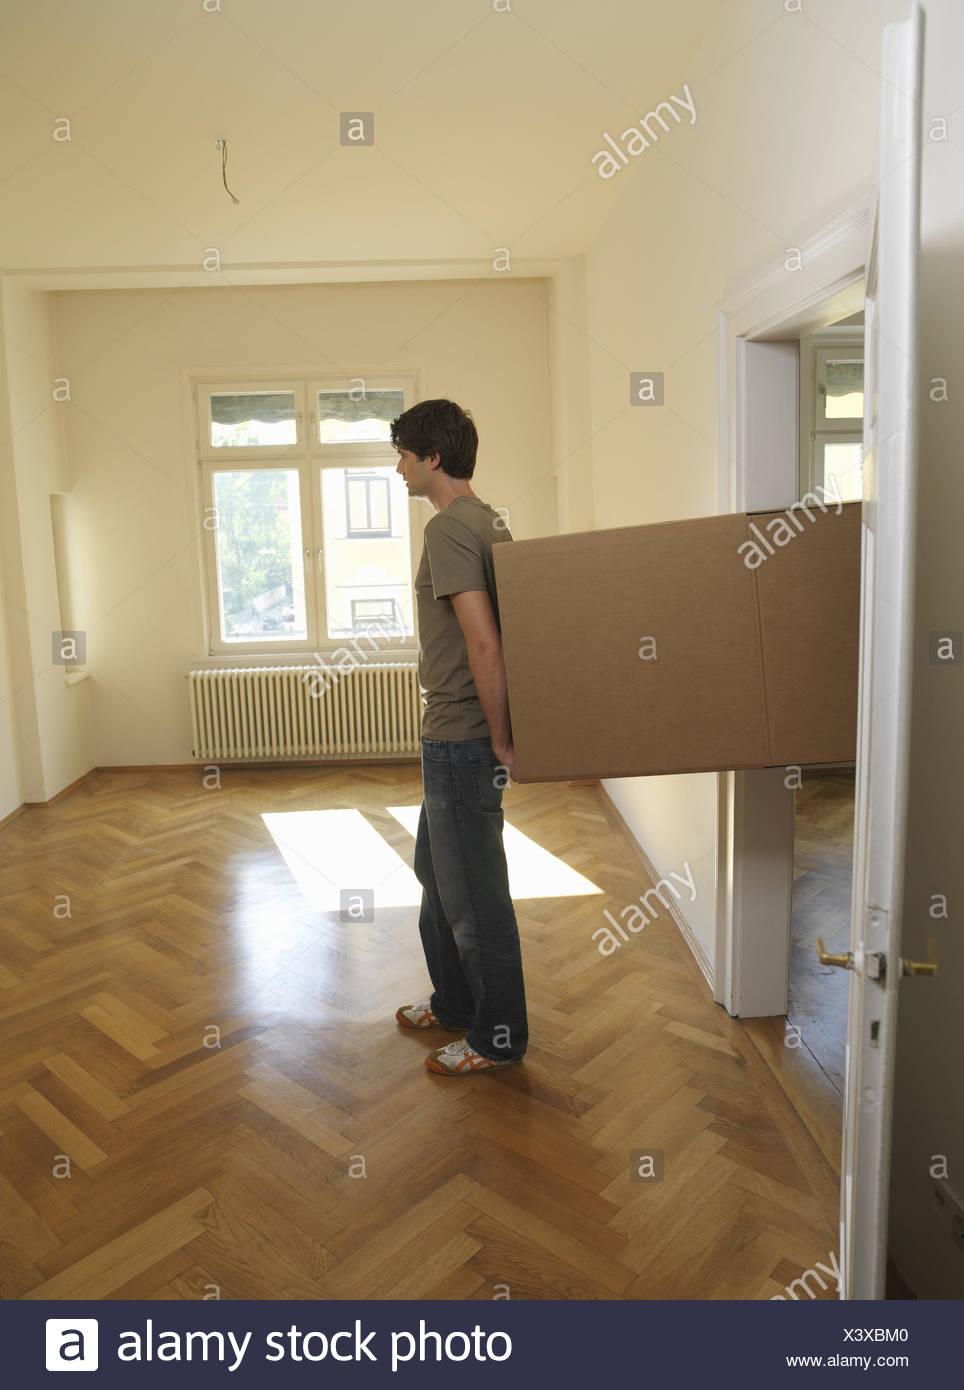 Zimmer Leer Mann Jung Prozession Pappe Carry Wohnung Zimmer